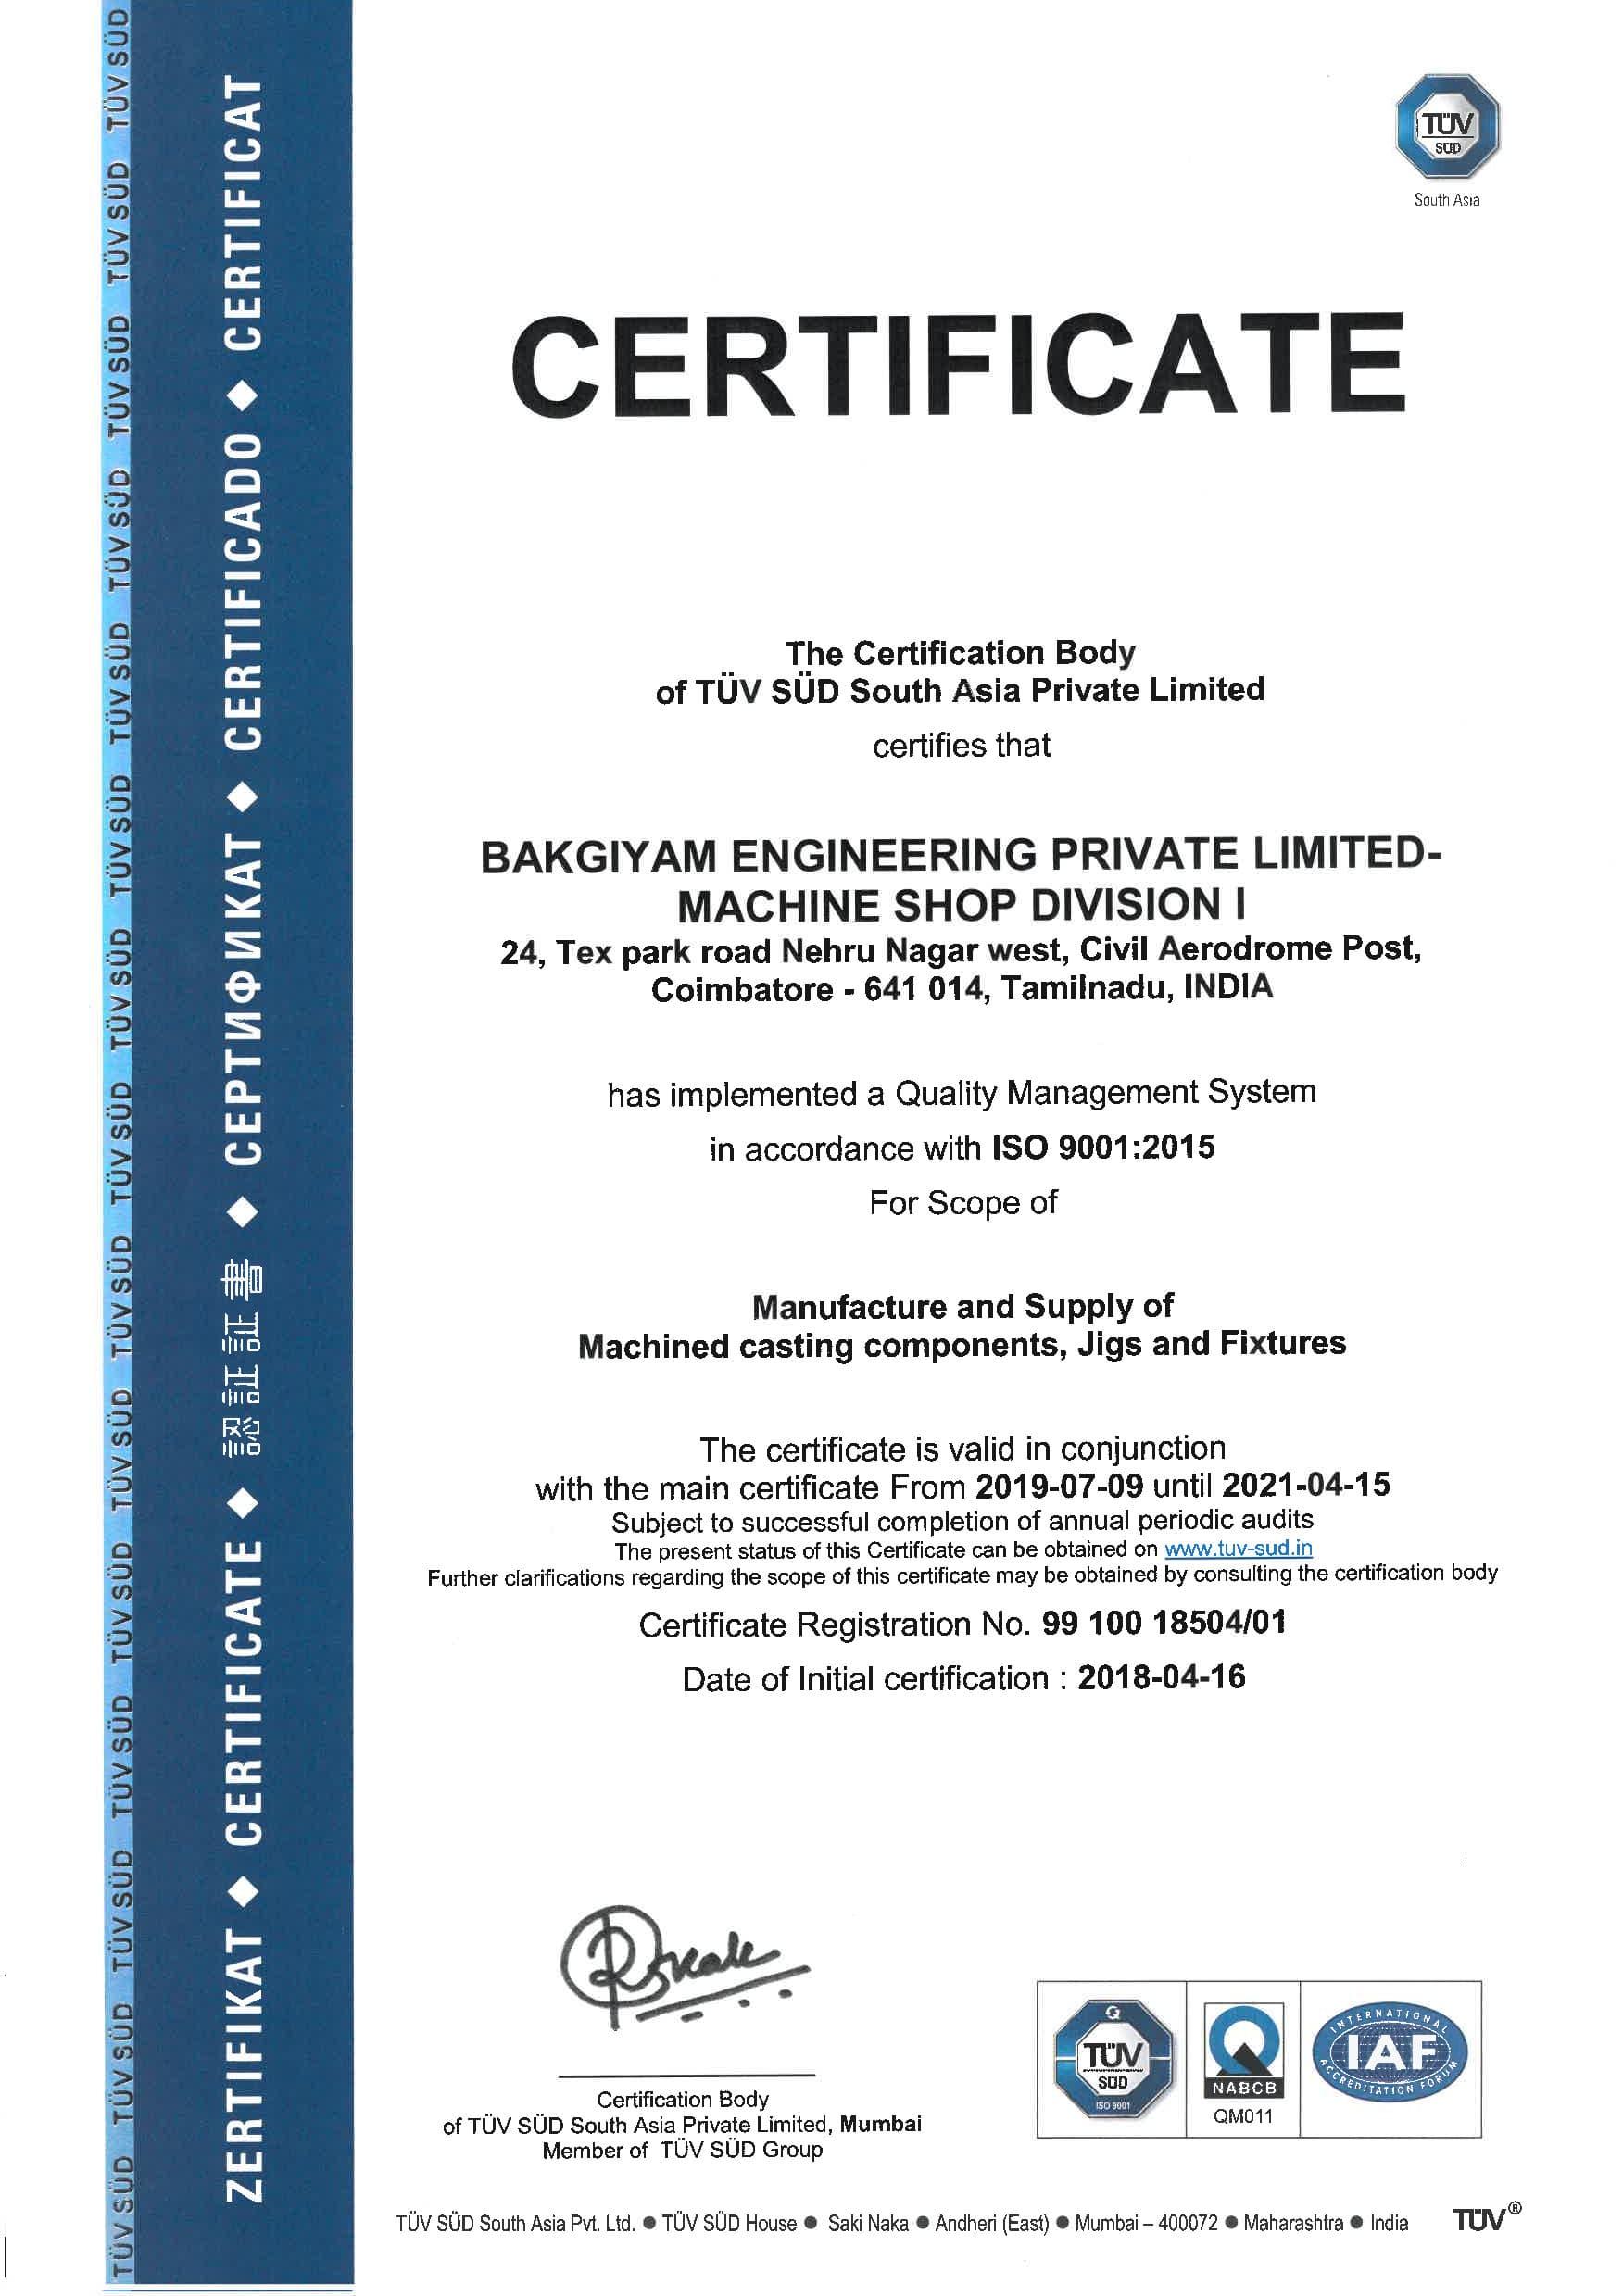 Machine Shop DIvision I Certificate - Bakgiyam Engineering